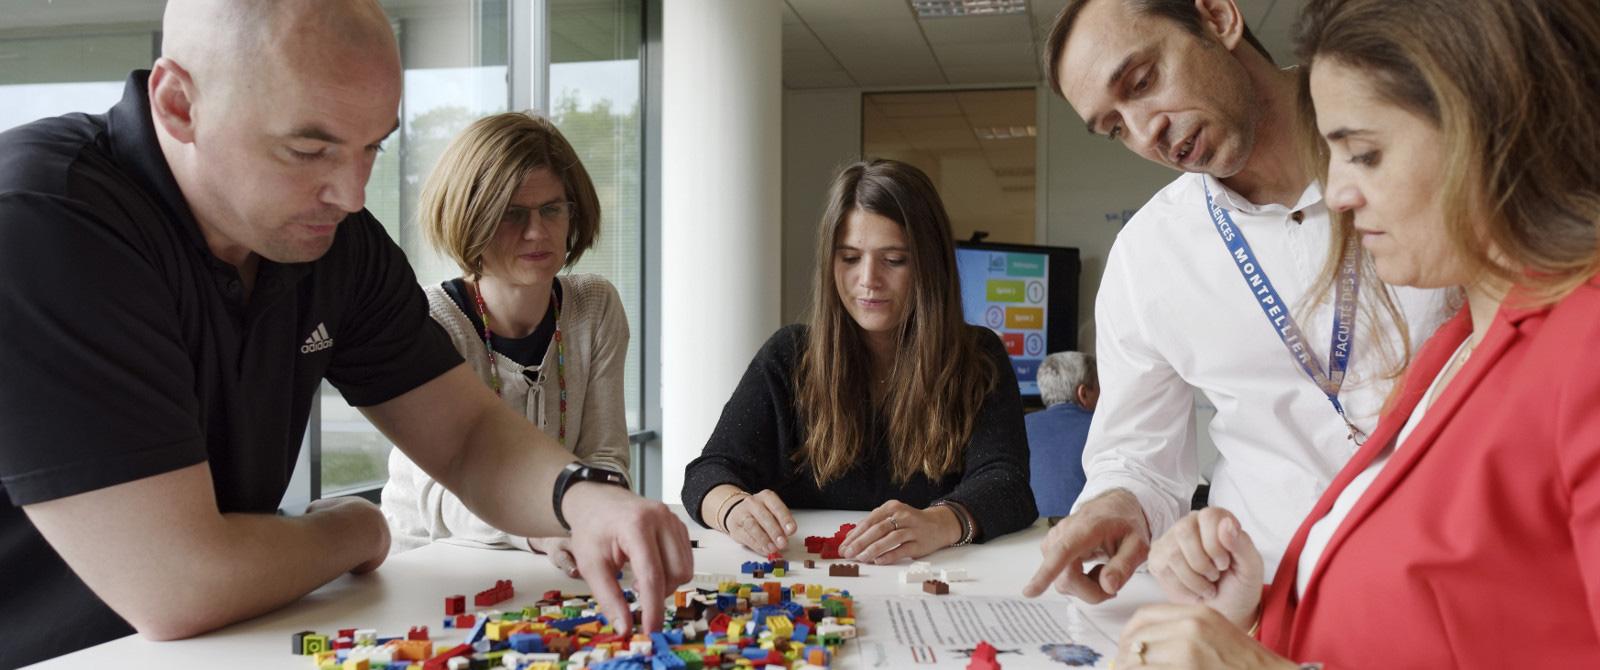 2018 - Groupe Renault Team building innovation